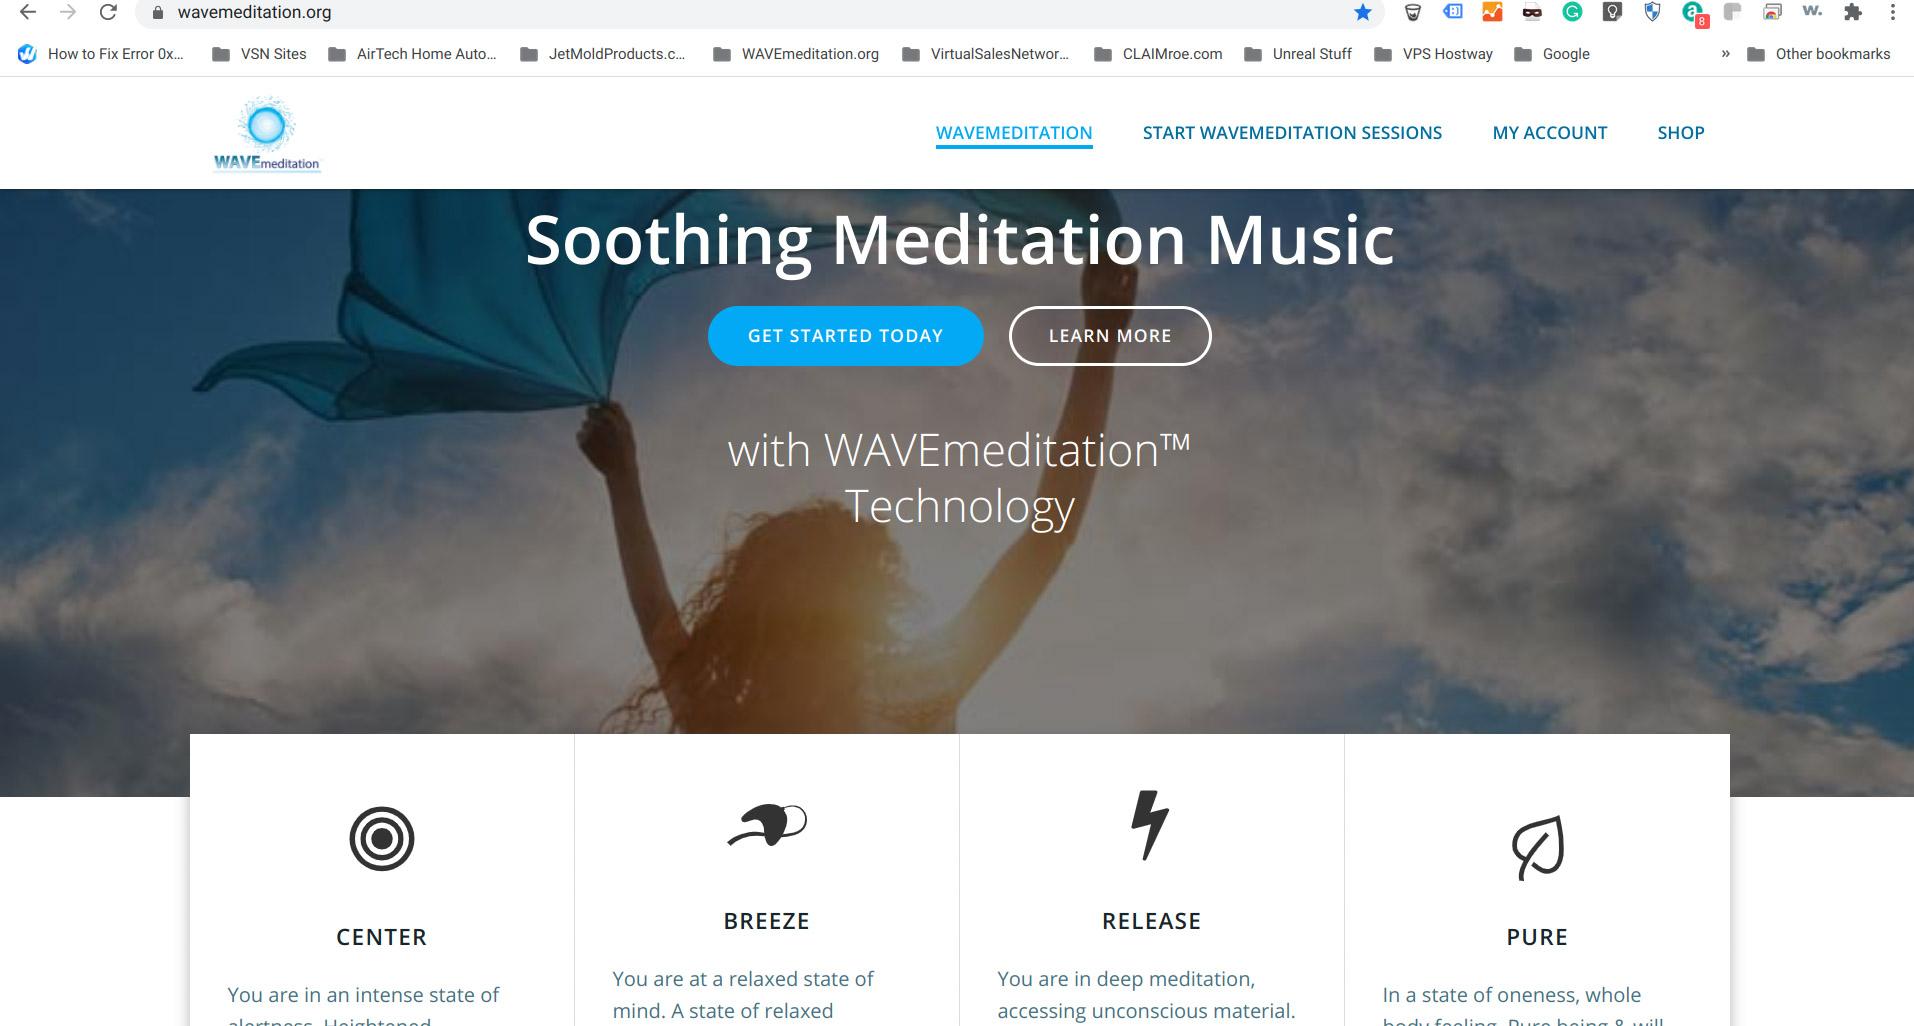 WAVemeditation.org